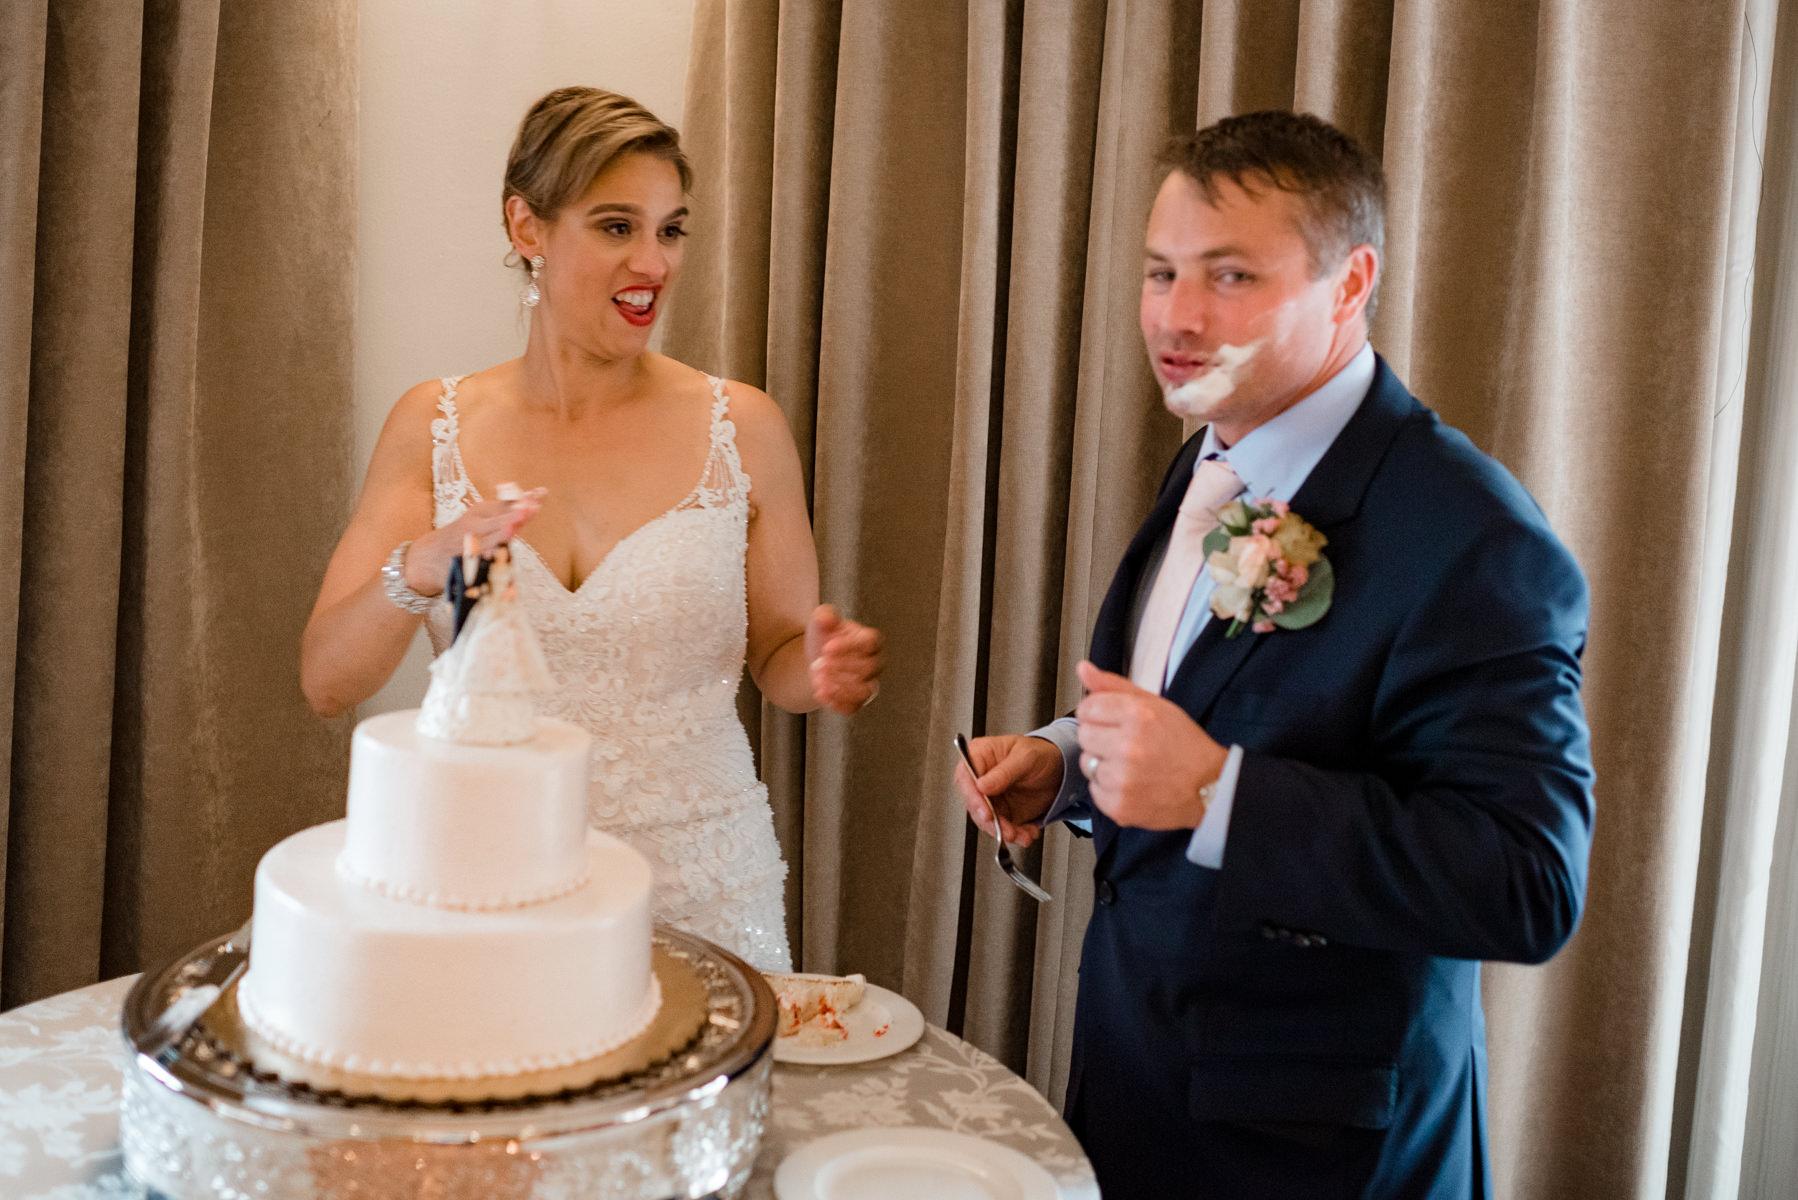 Andrew Tat - Documentary Wedding Photography - Hotel Sorrento - Seattle, Washington -Jessica & Paul - 37.jpg